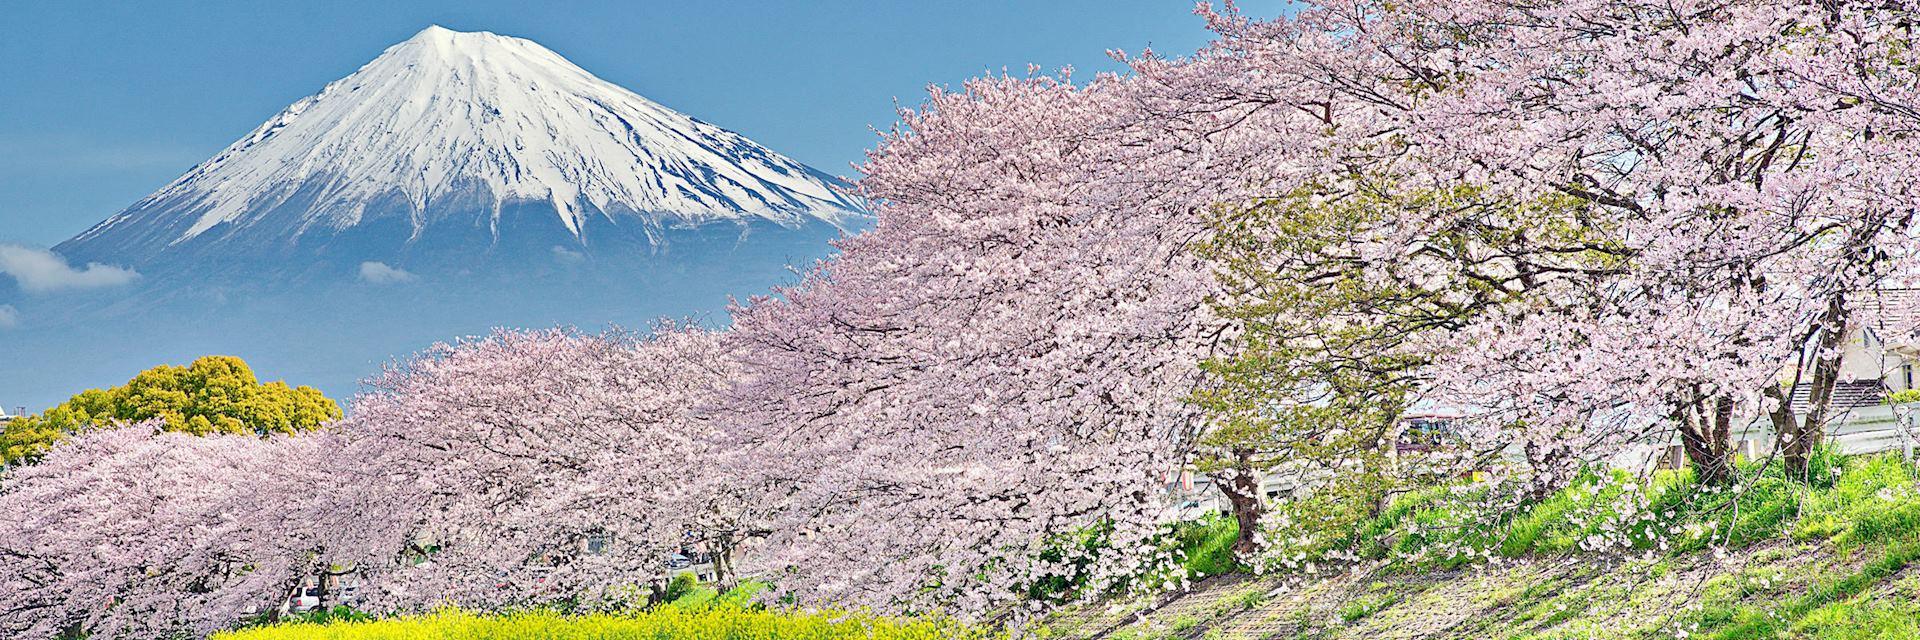 Cherry blossom on the Uruigawa River, near Mount Fuji